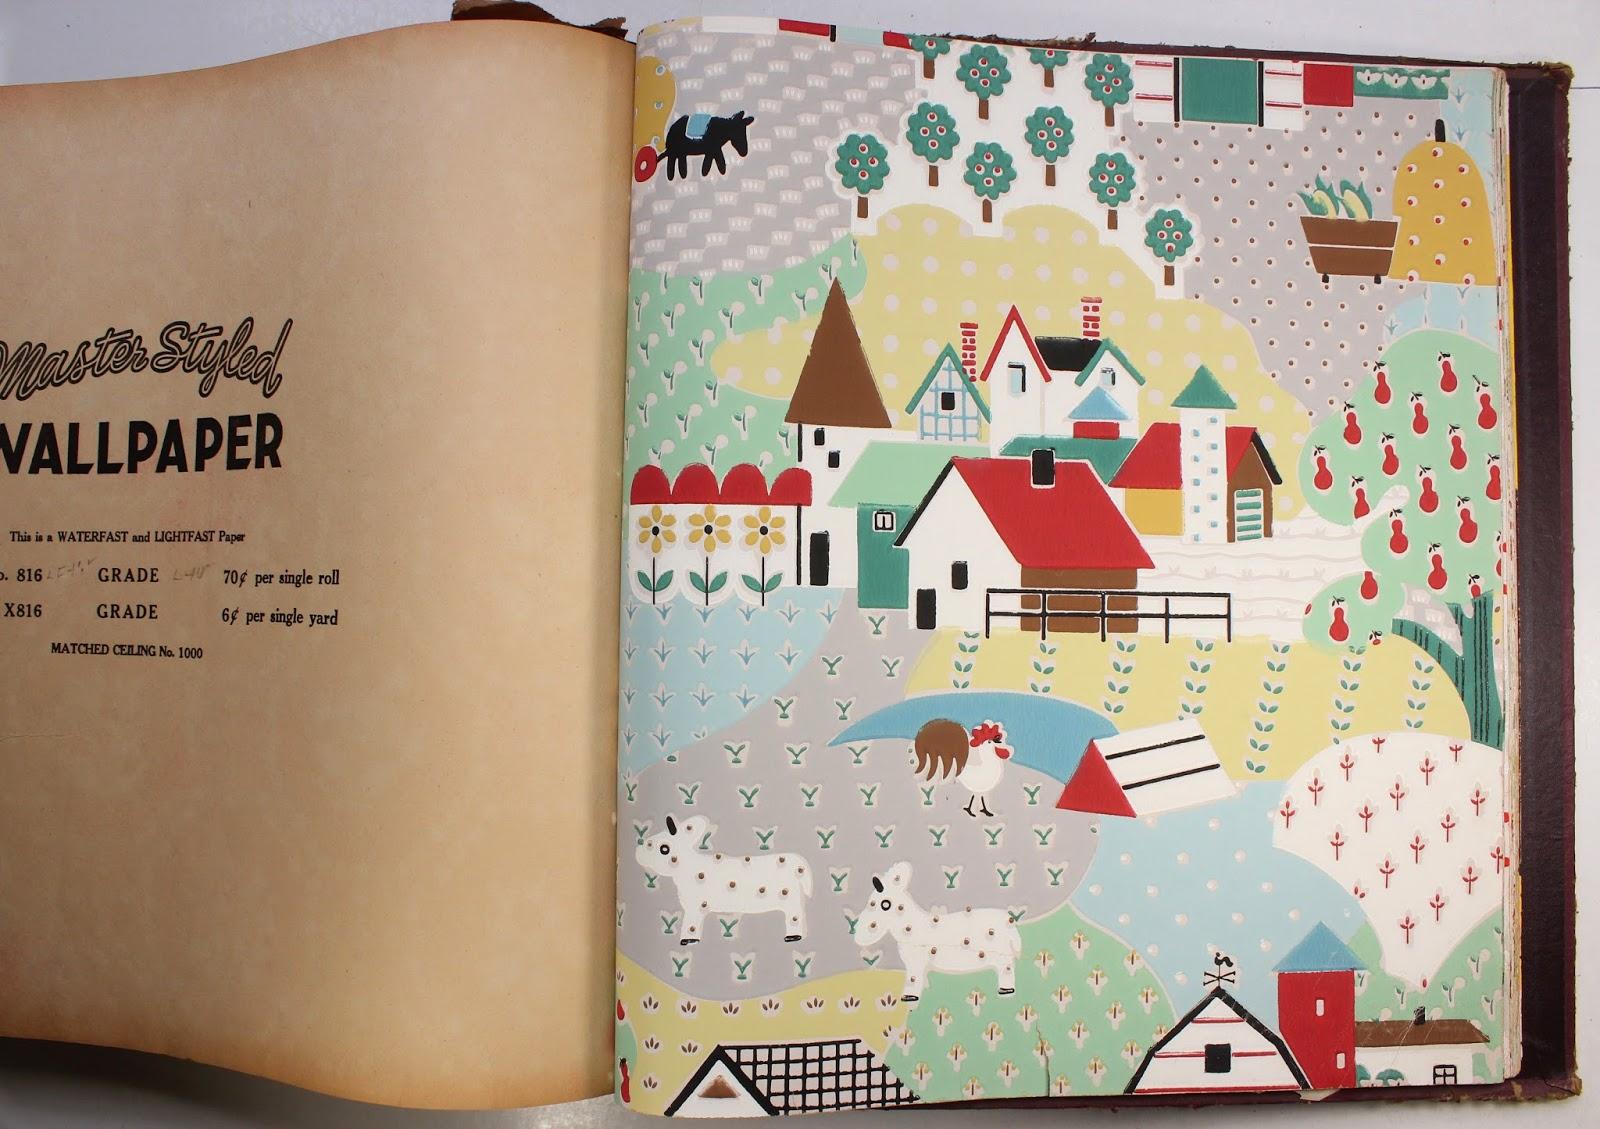 wallpaper sample book - photo #17